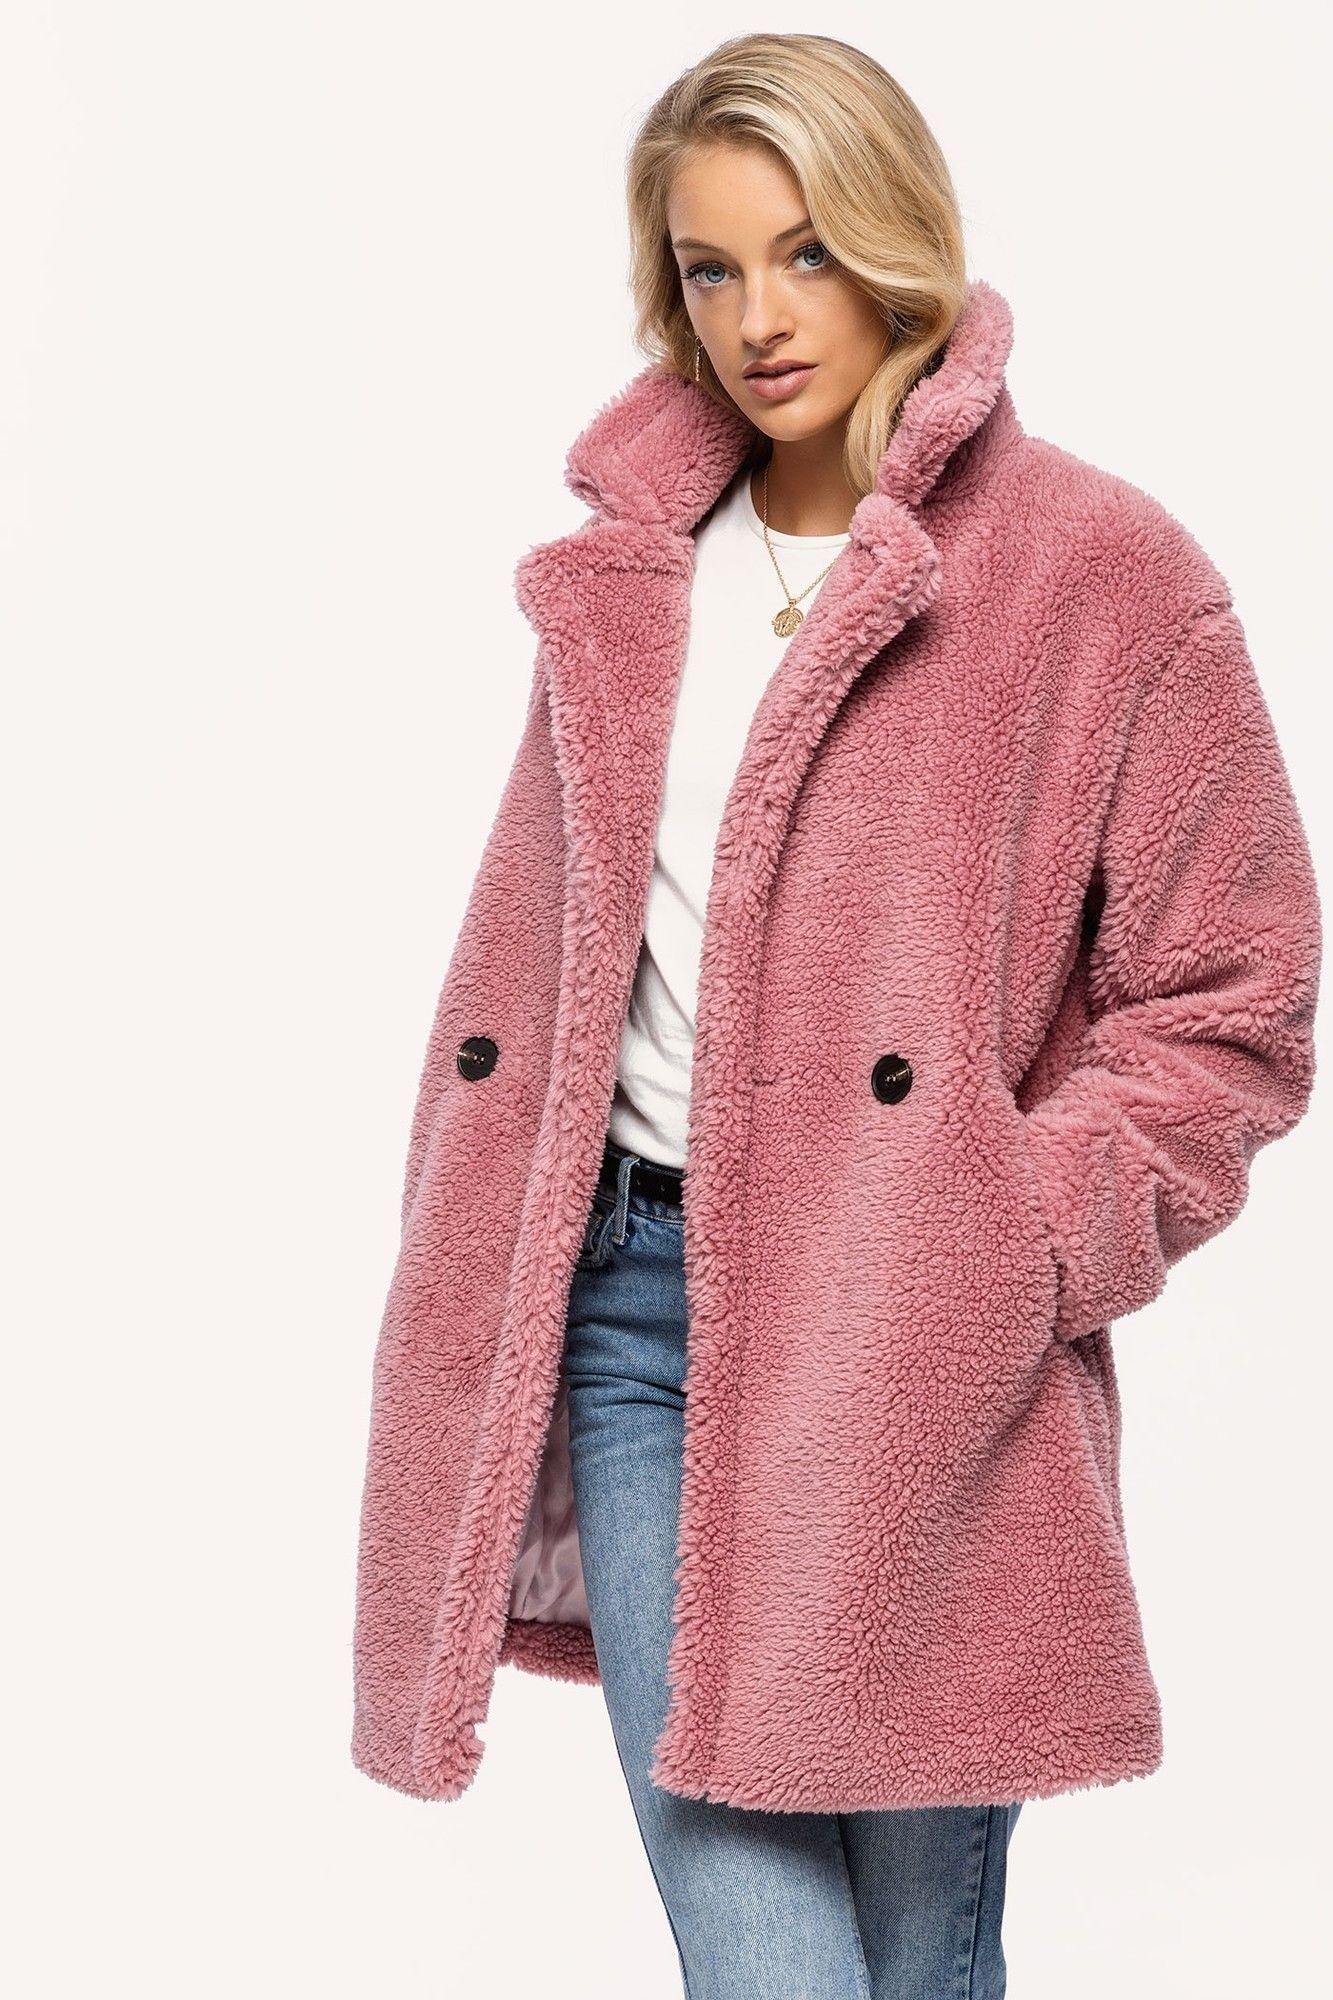 CoatSpring In Pink Summer Loavies Teddy wPvmn0OyN8